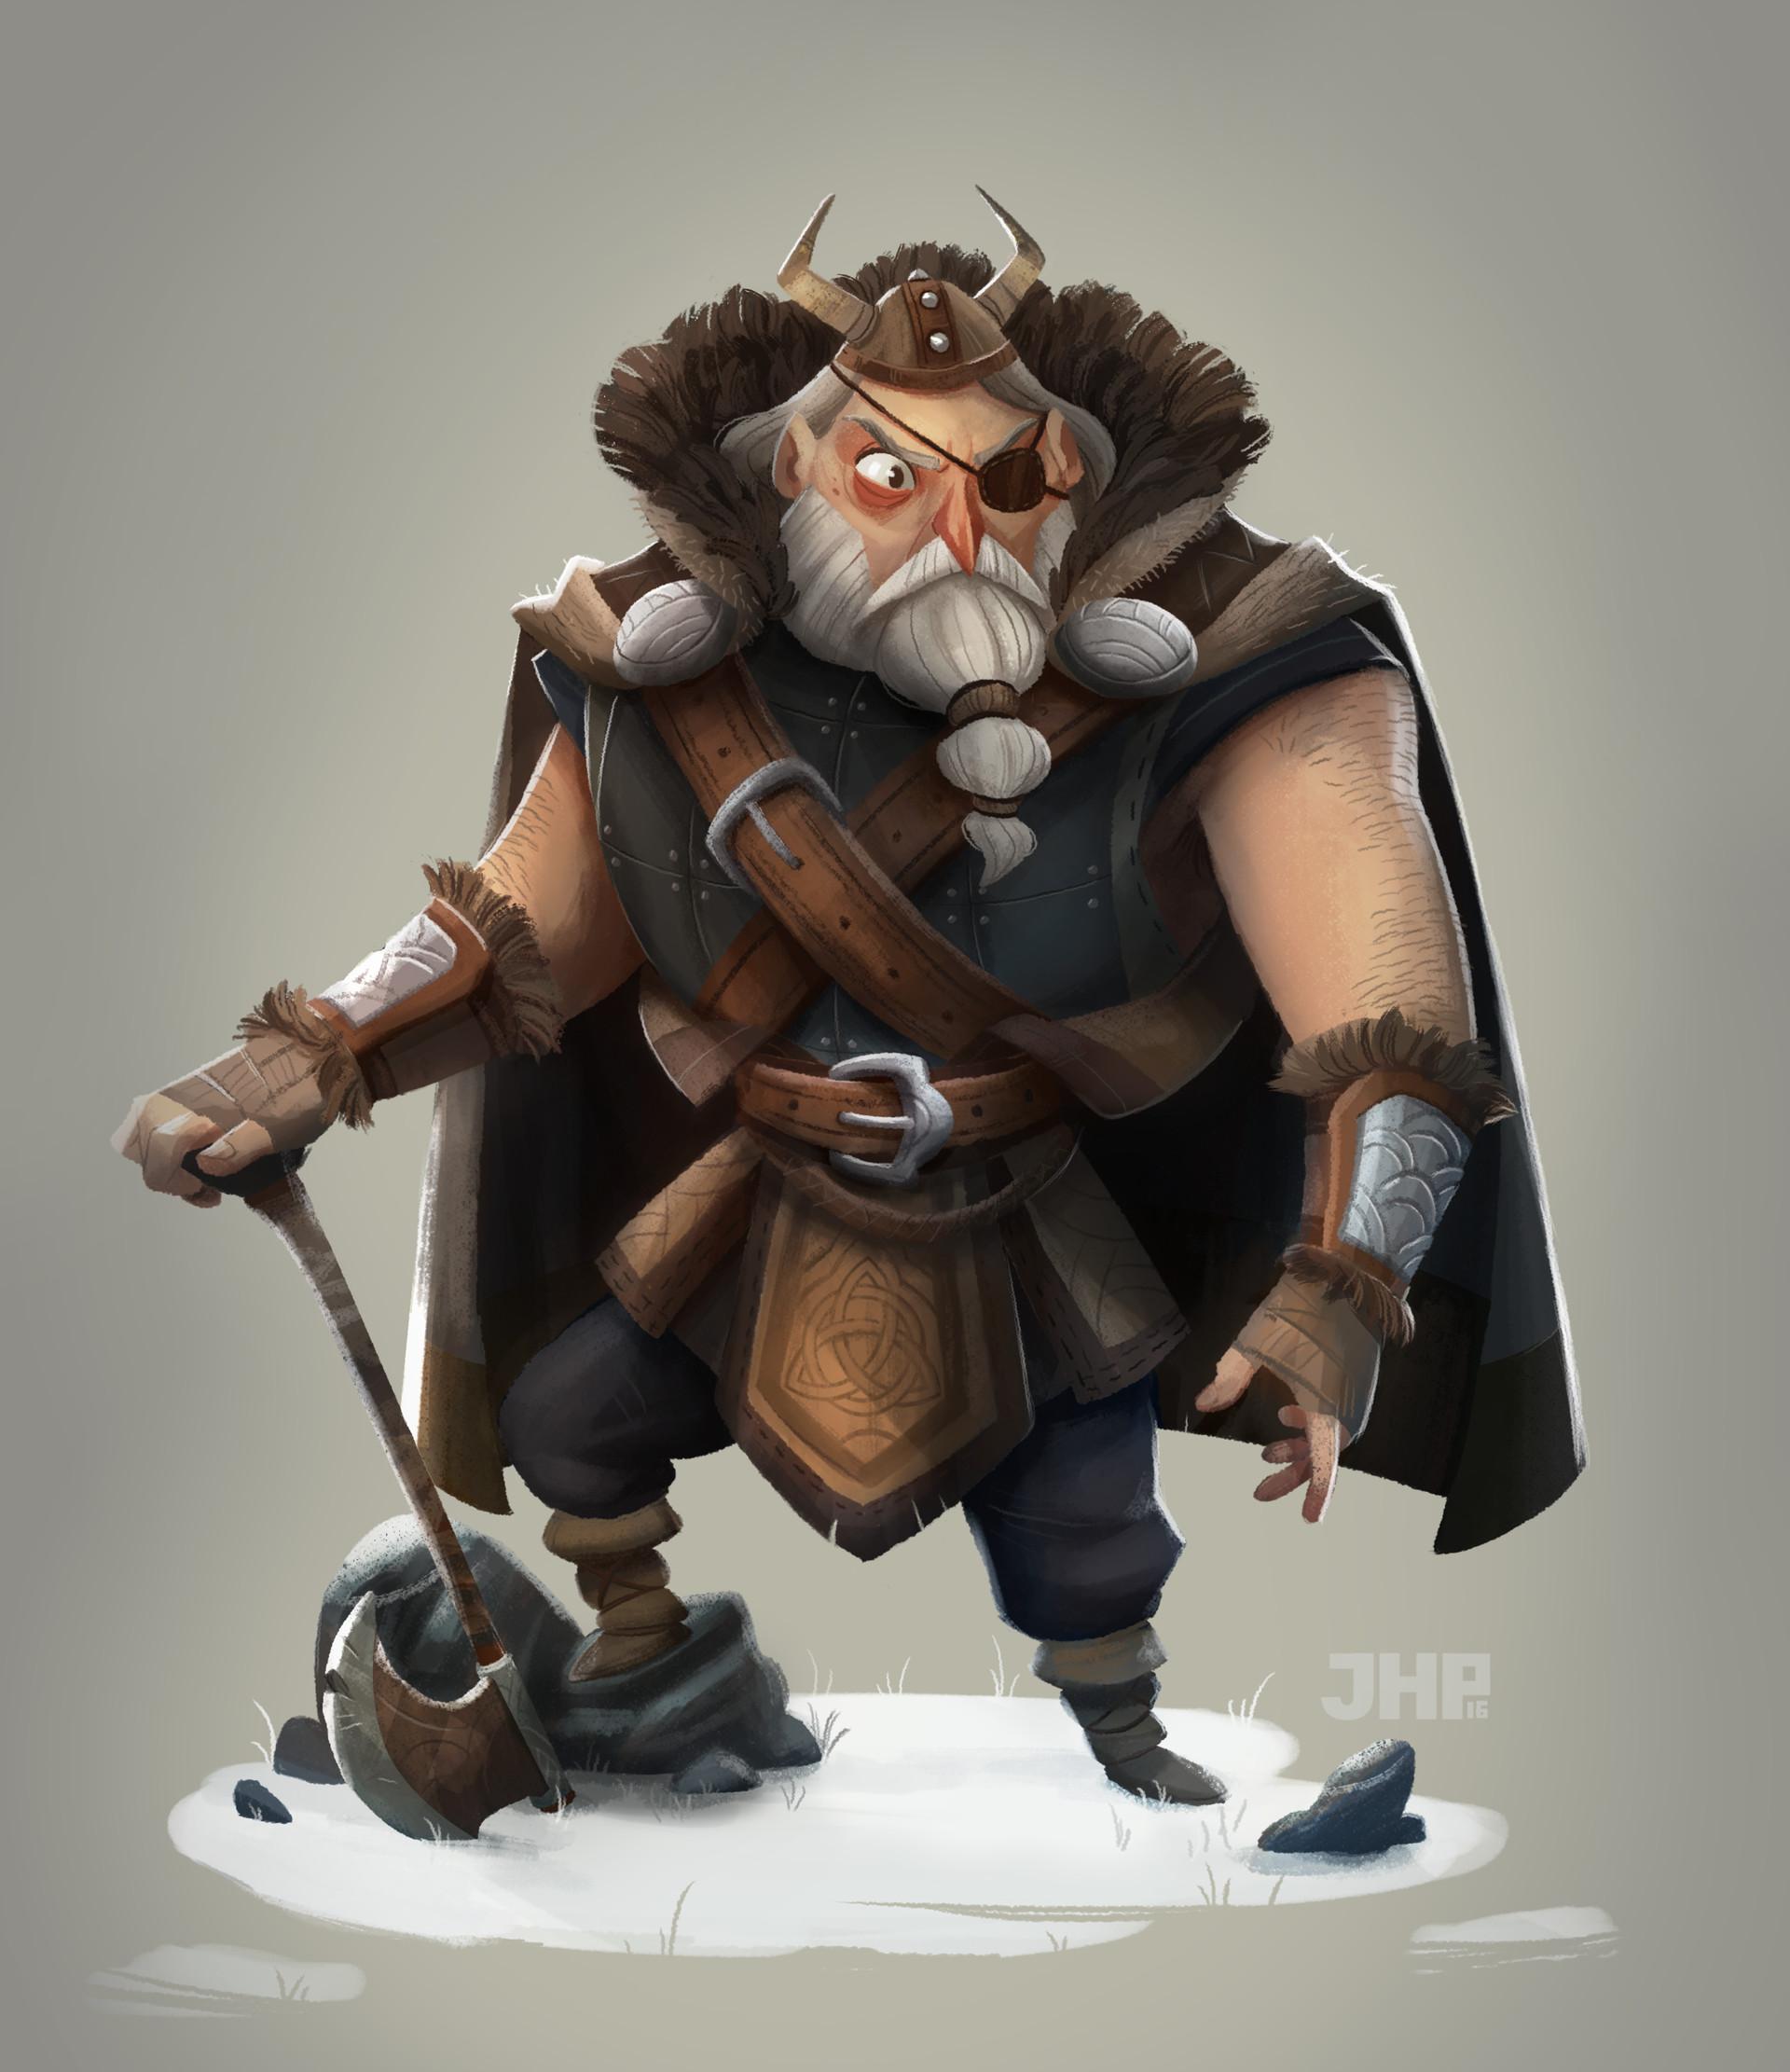 Joao henrique pacheco vikink